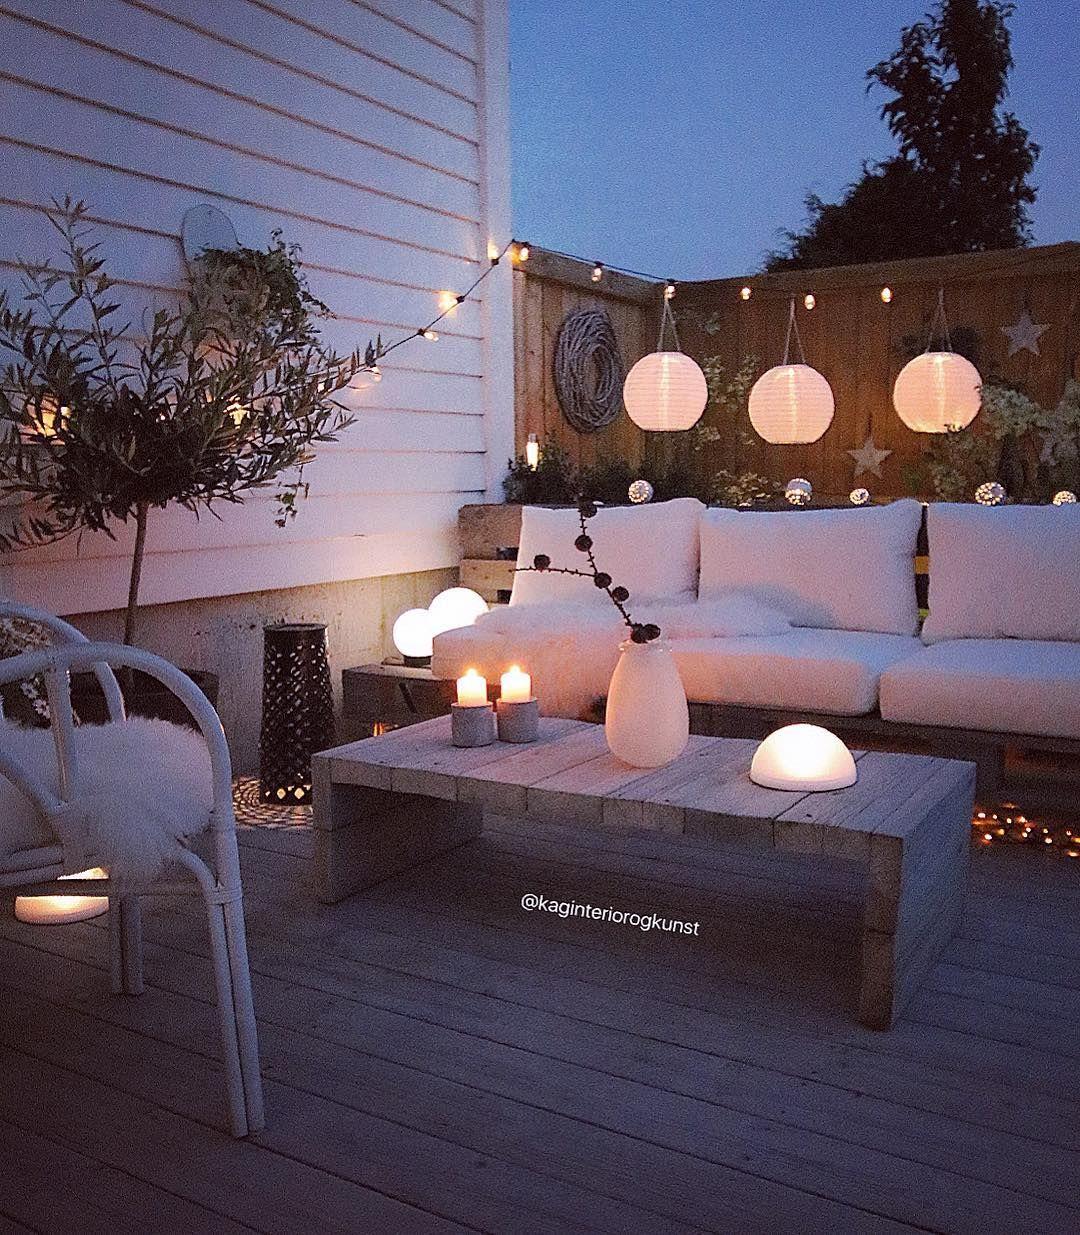 Outdoor Party Lights Ikea: Pin By Wanda-jade Deguara On House Ideas ☆